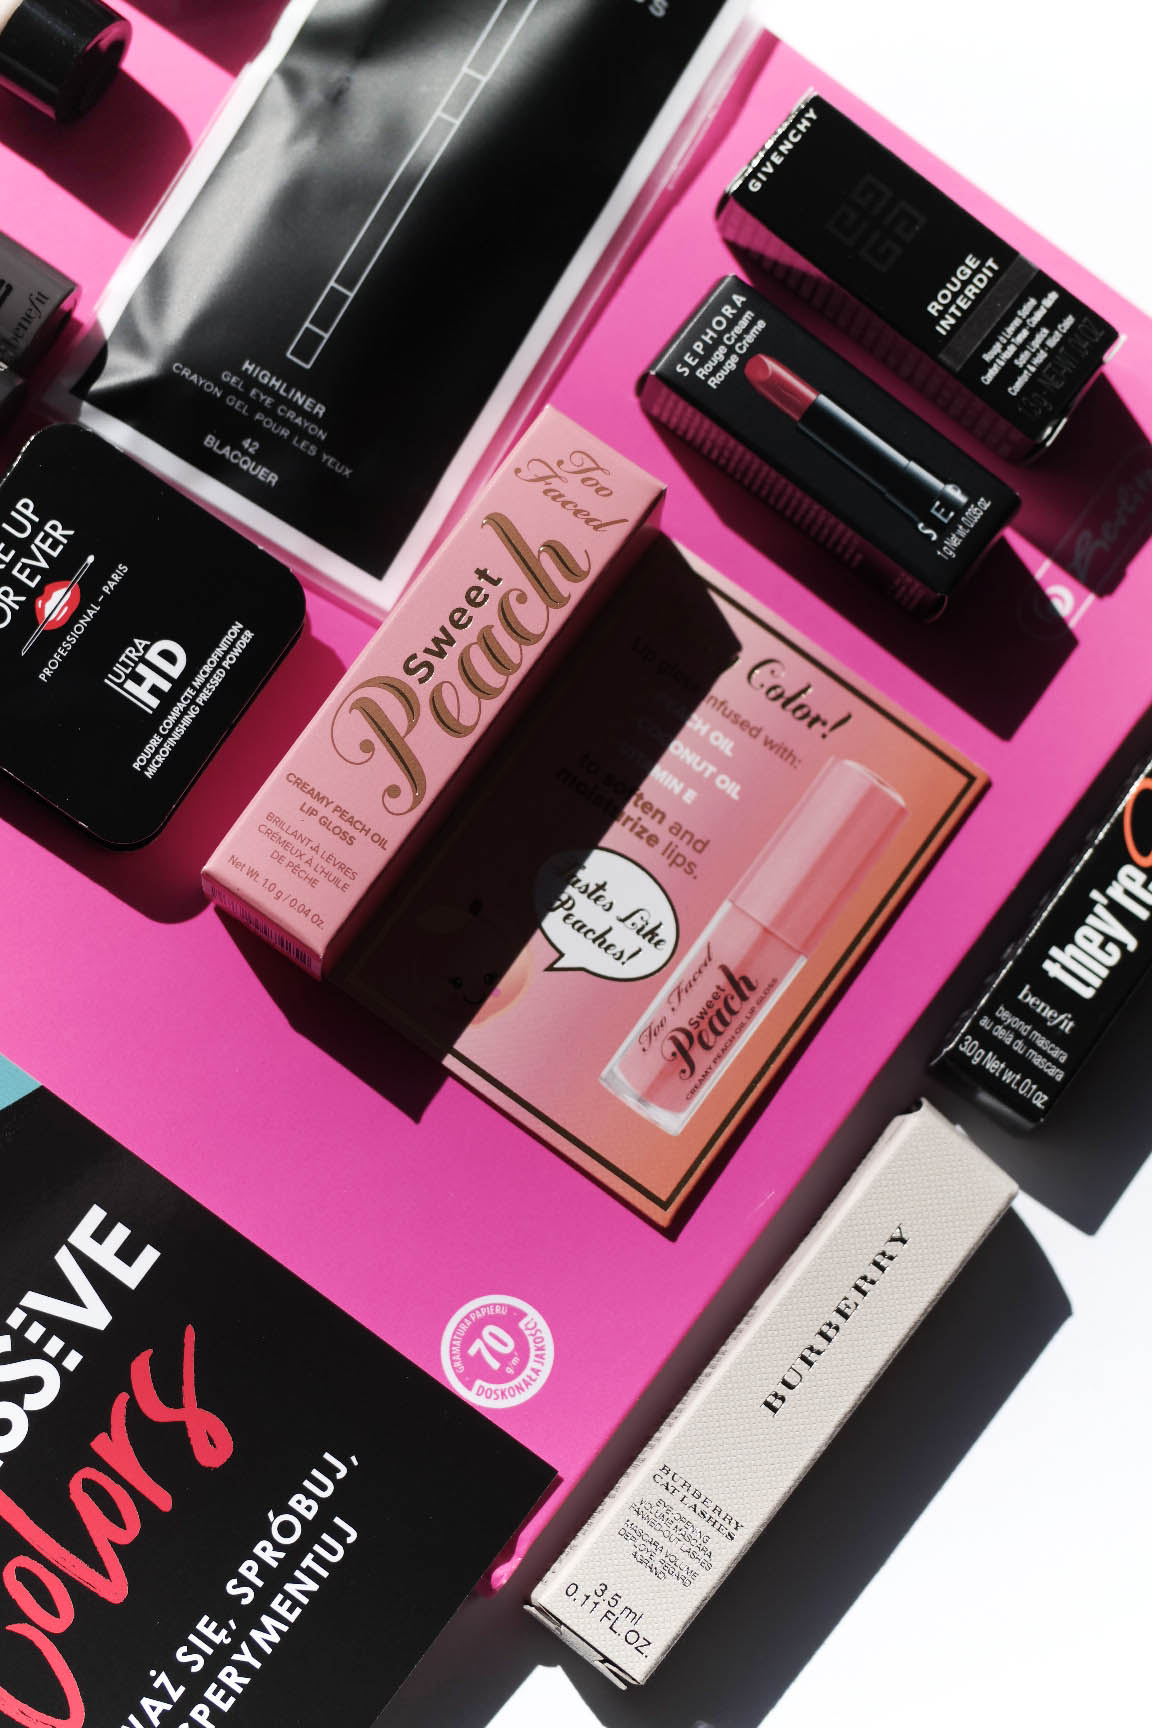 Sephora Box | EXCESSIVE COLORS marzec 2017